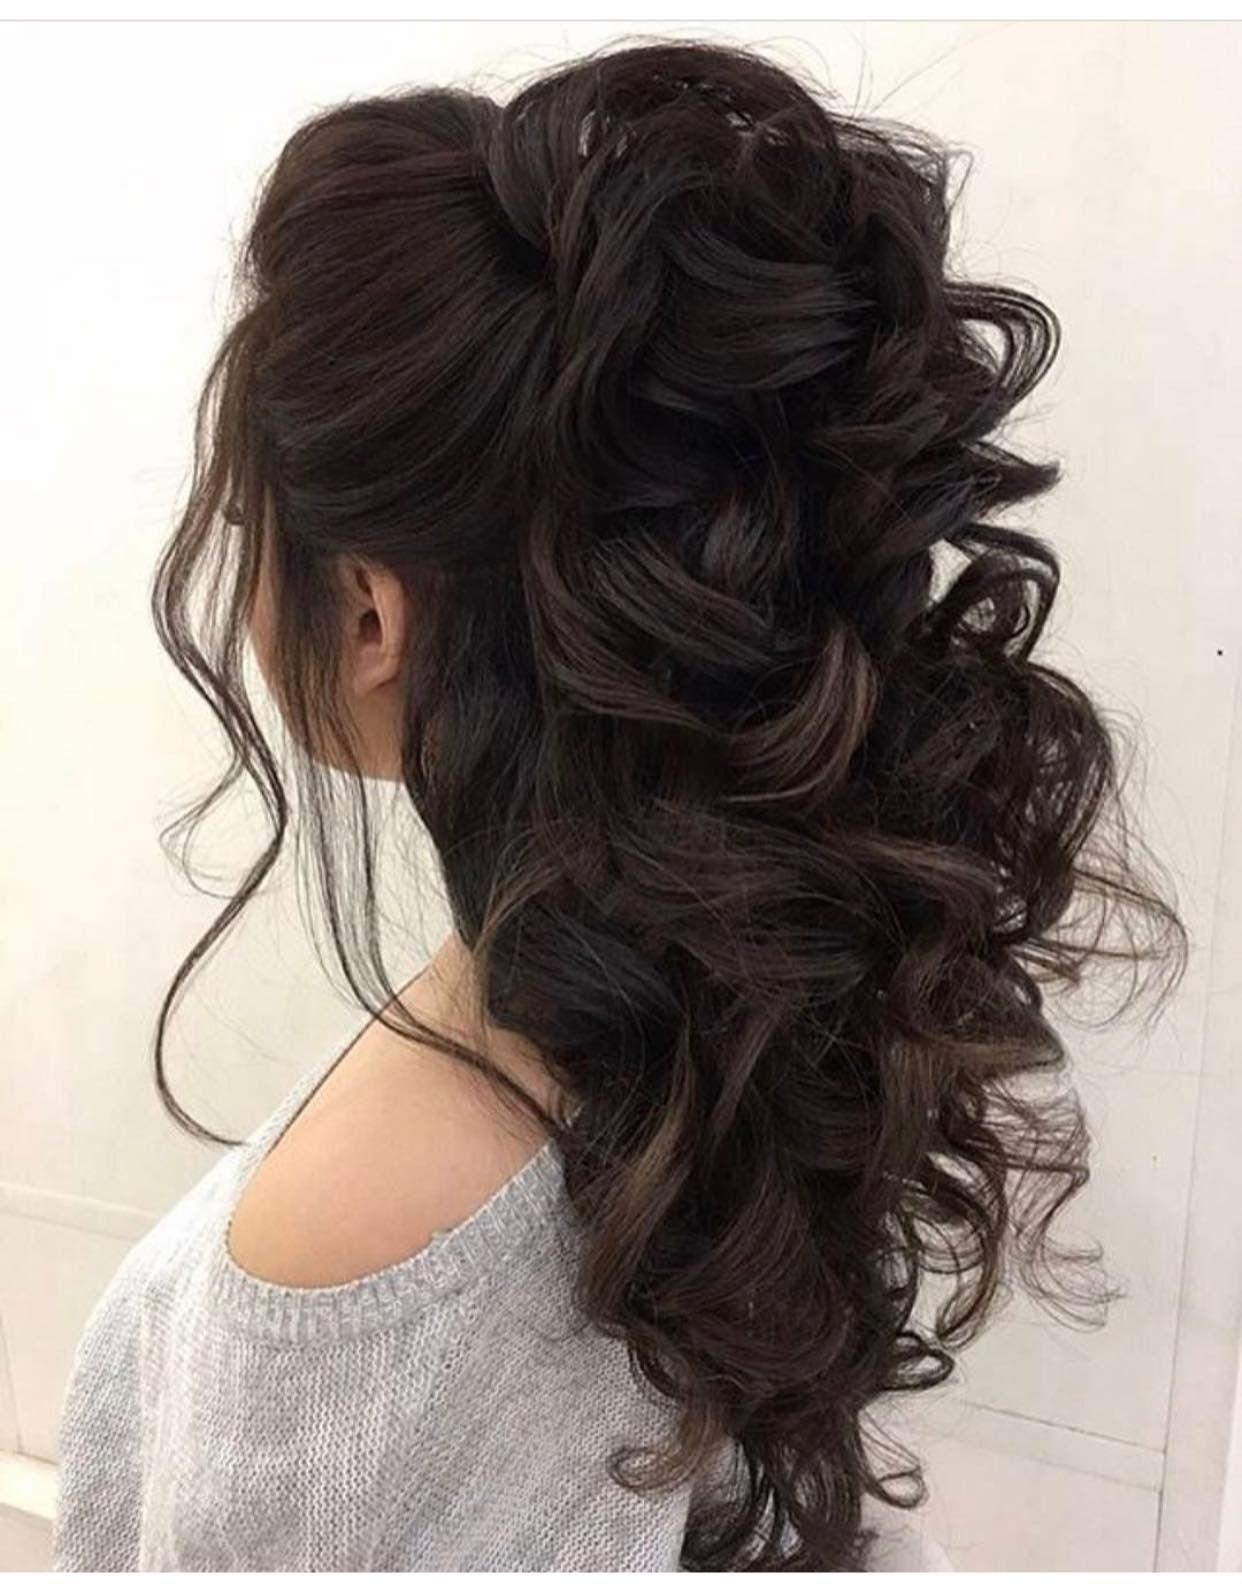 Bridal Hair Half Do Estilos De Peinado Para Boda Peinados Boda Pelo Largo Peinados De Novia